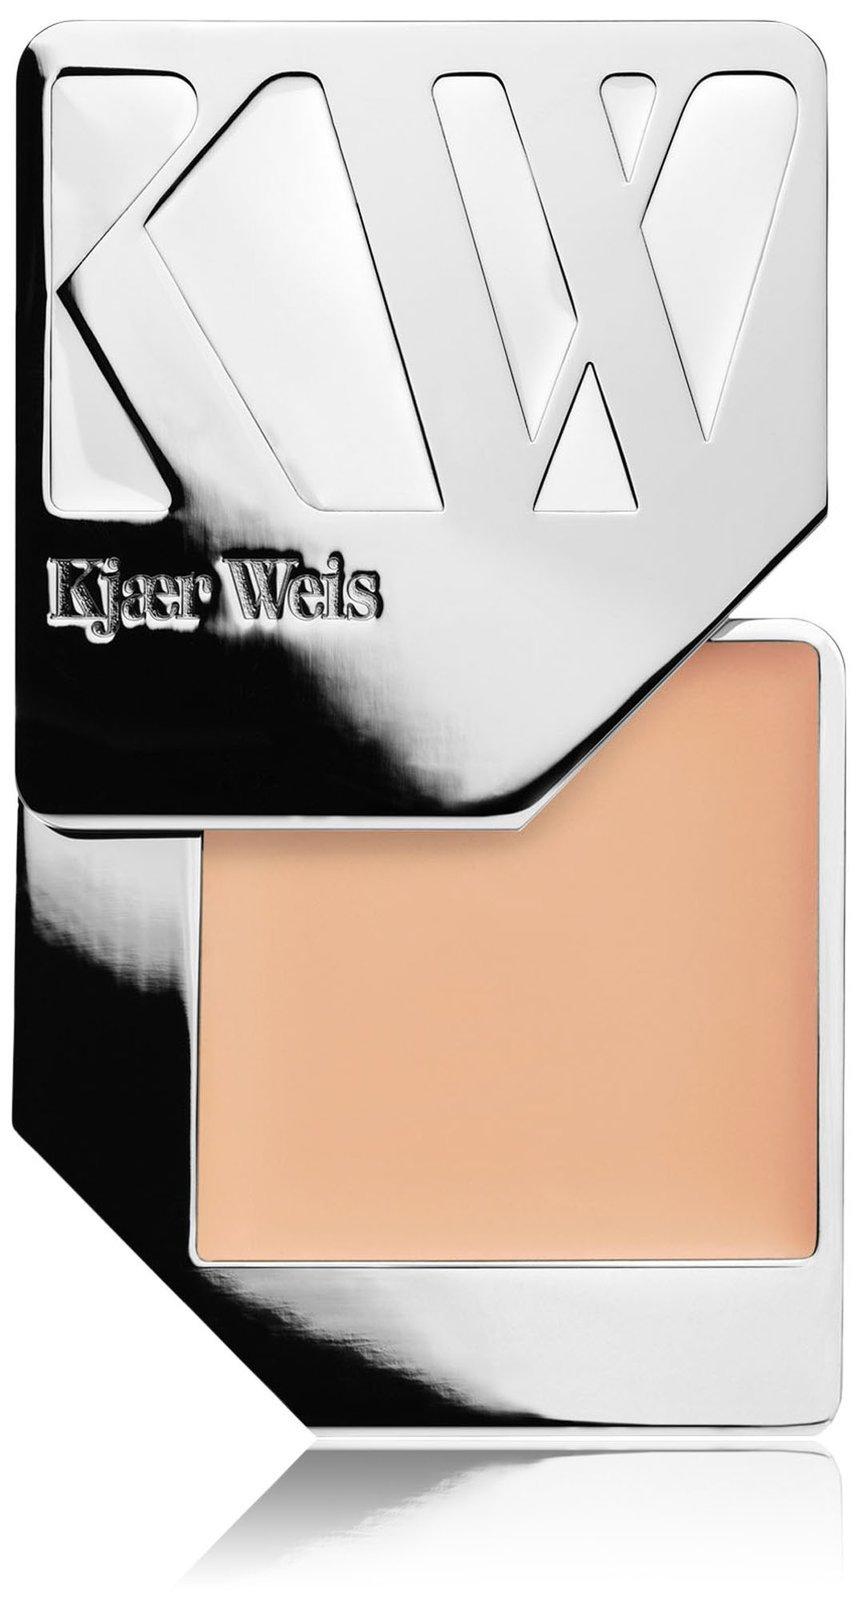 Kjaer Weis Kjaer Weis Foundation - Like Porcelain by Kjaer Weis (Image #1)